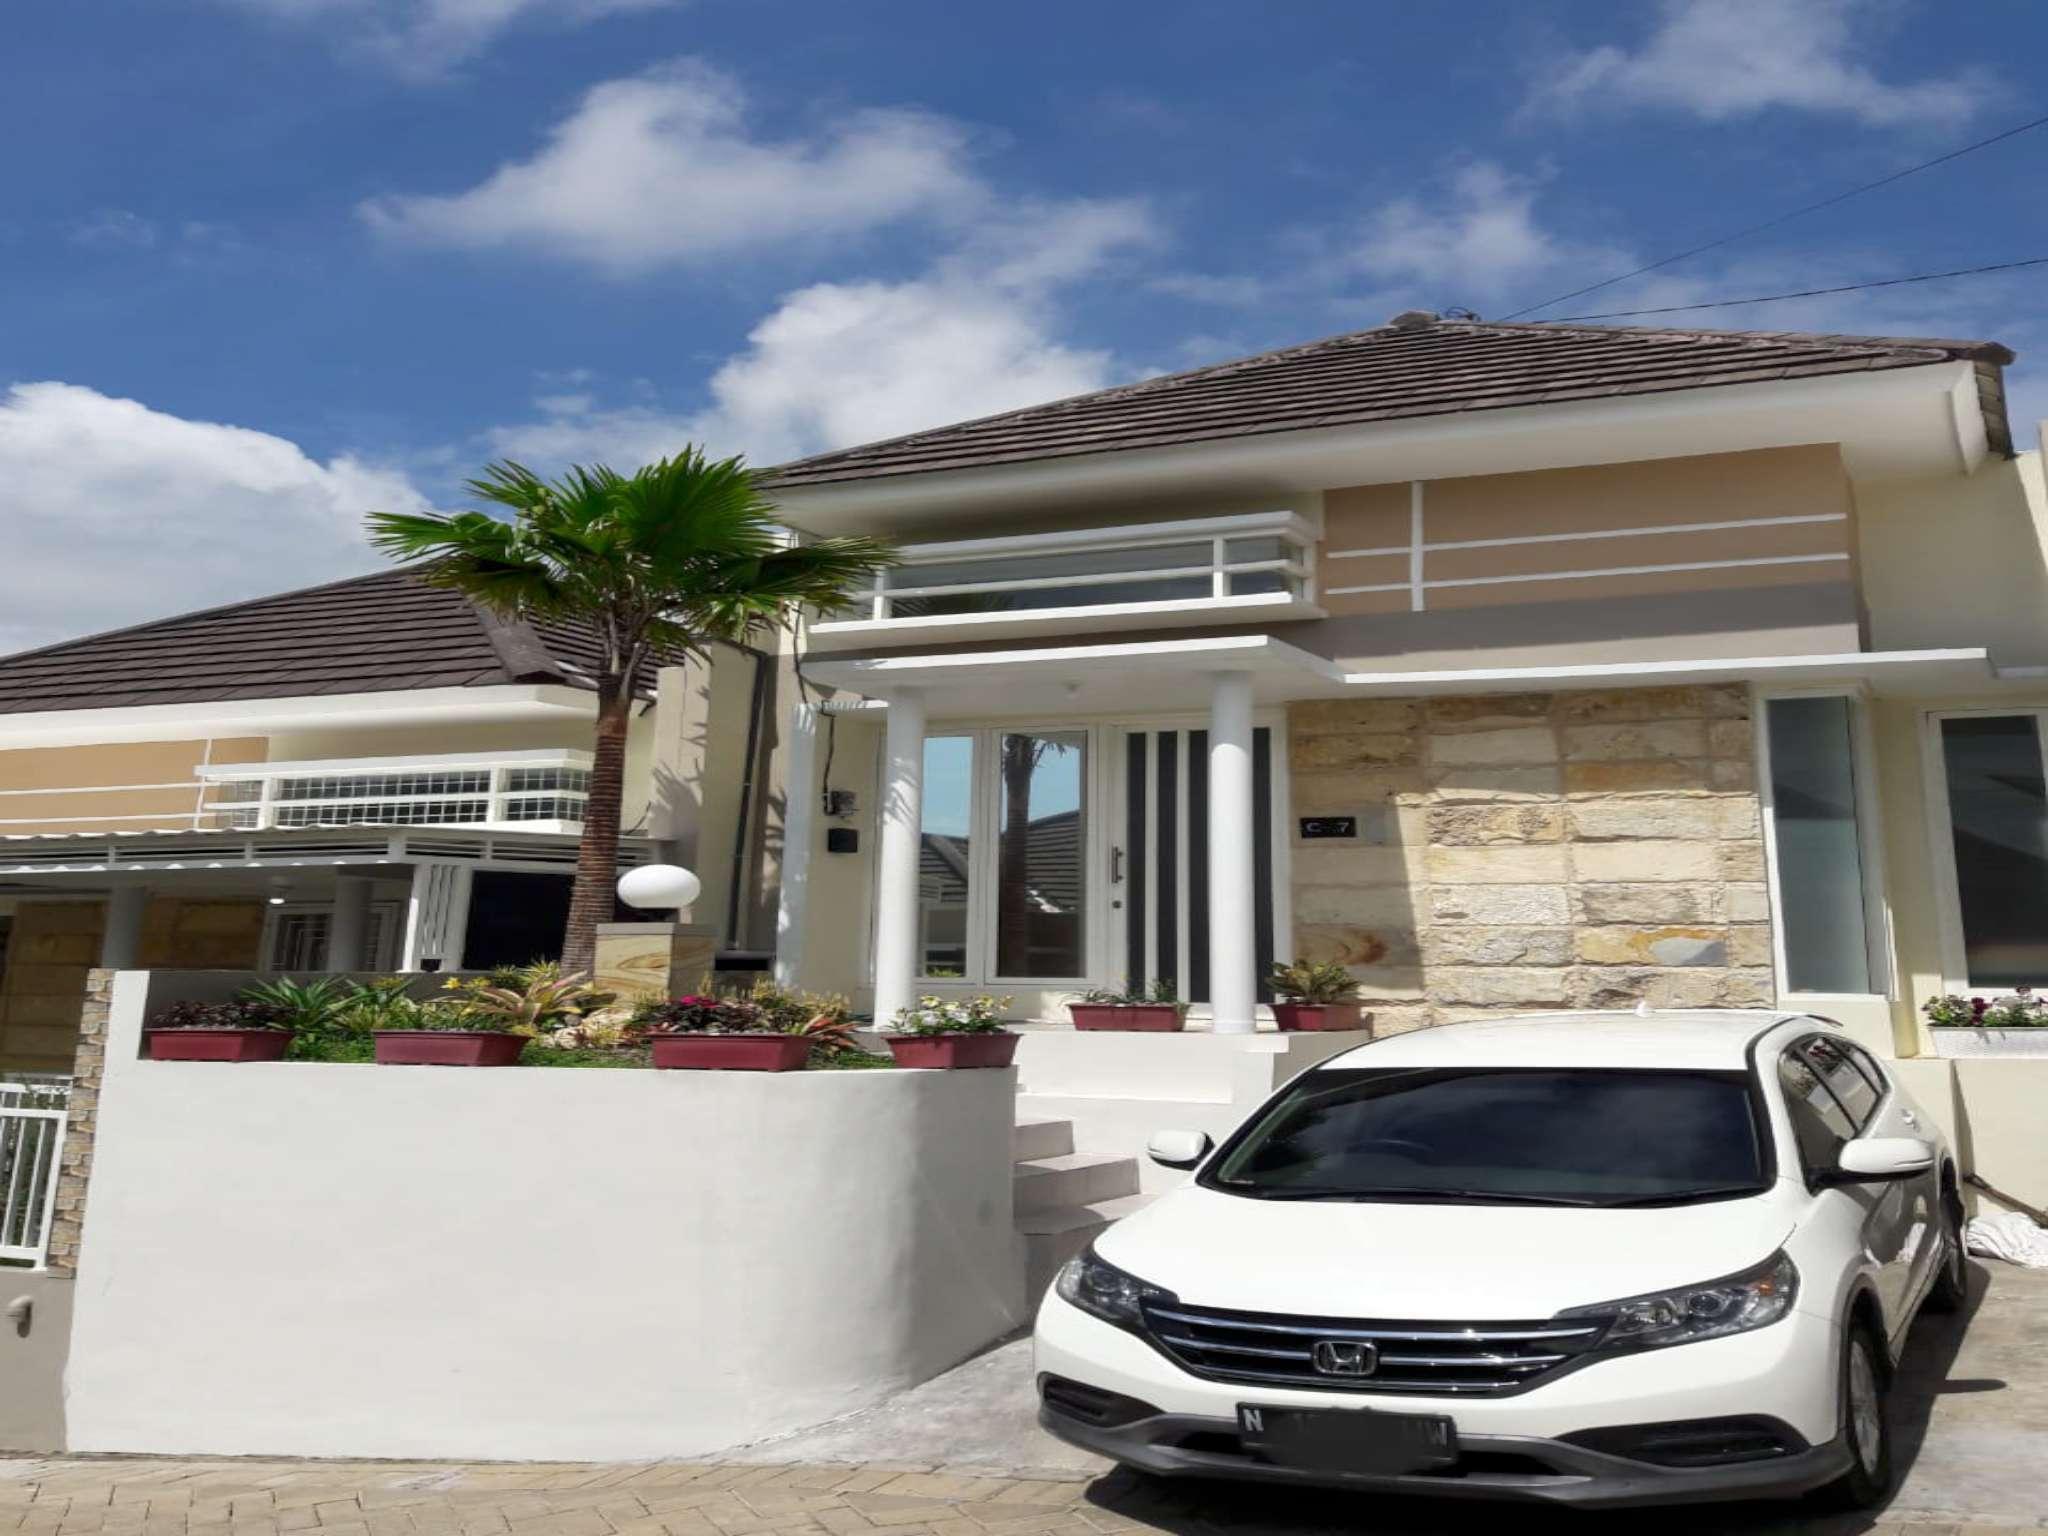 Villa Permata Garden C7 Batu, Malang